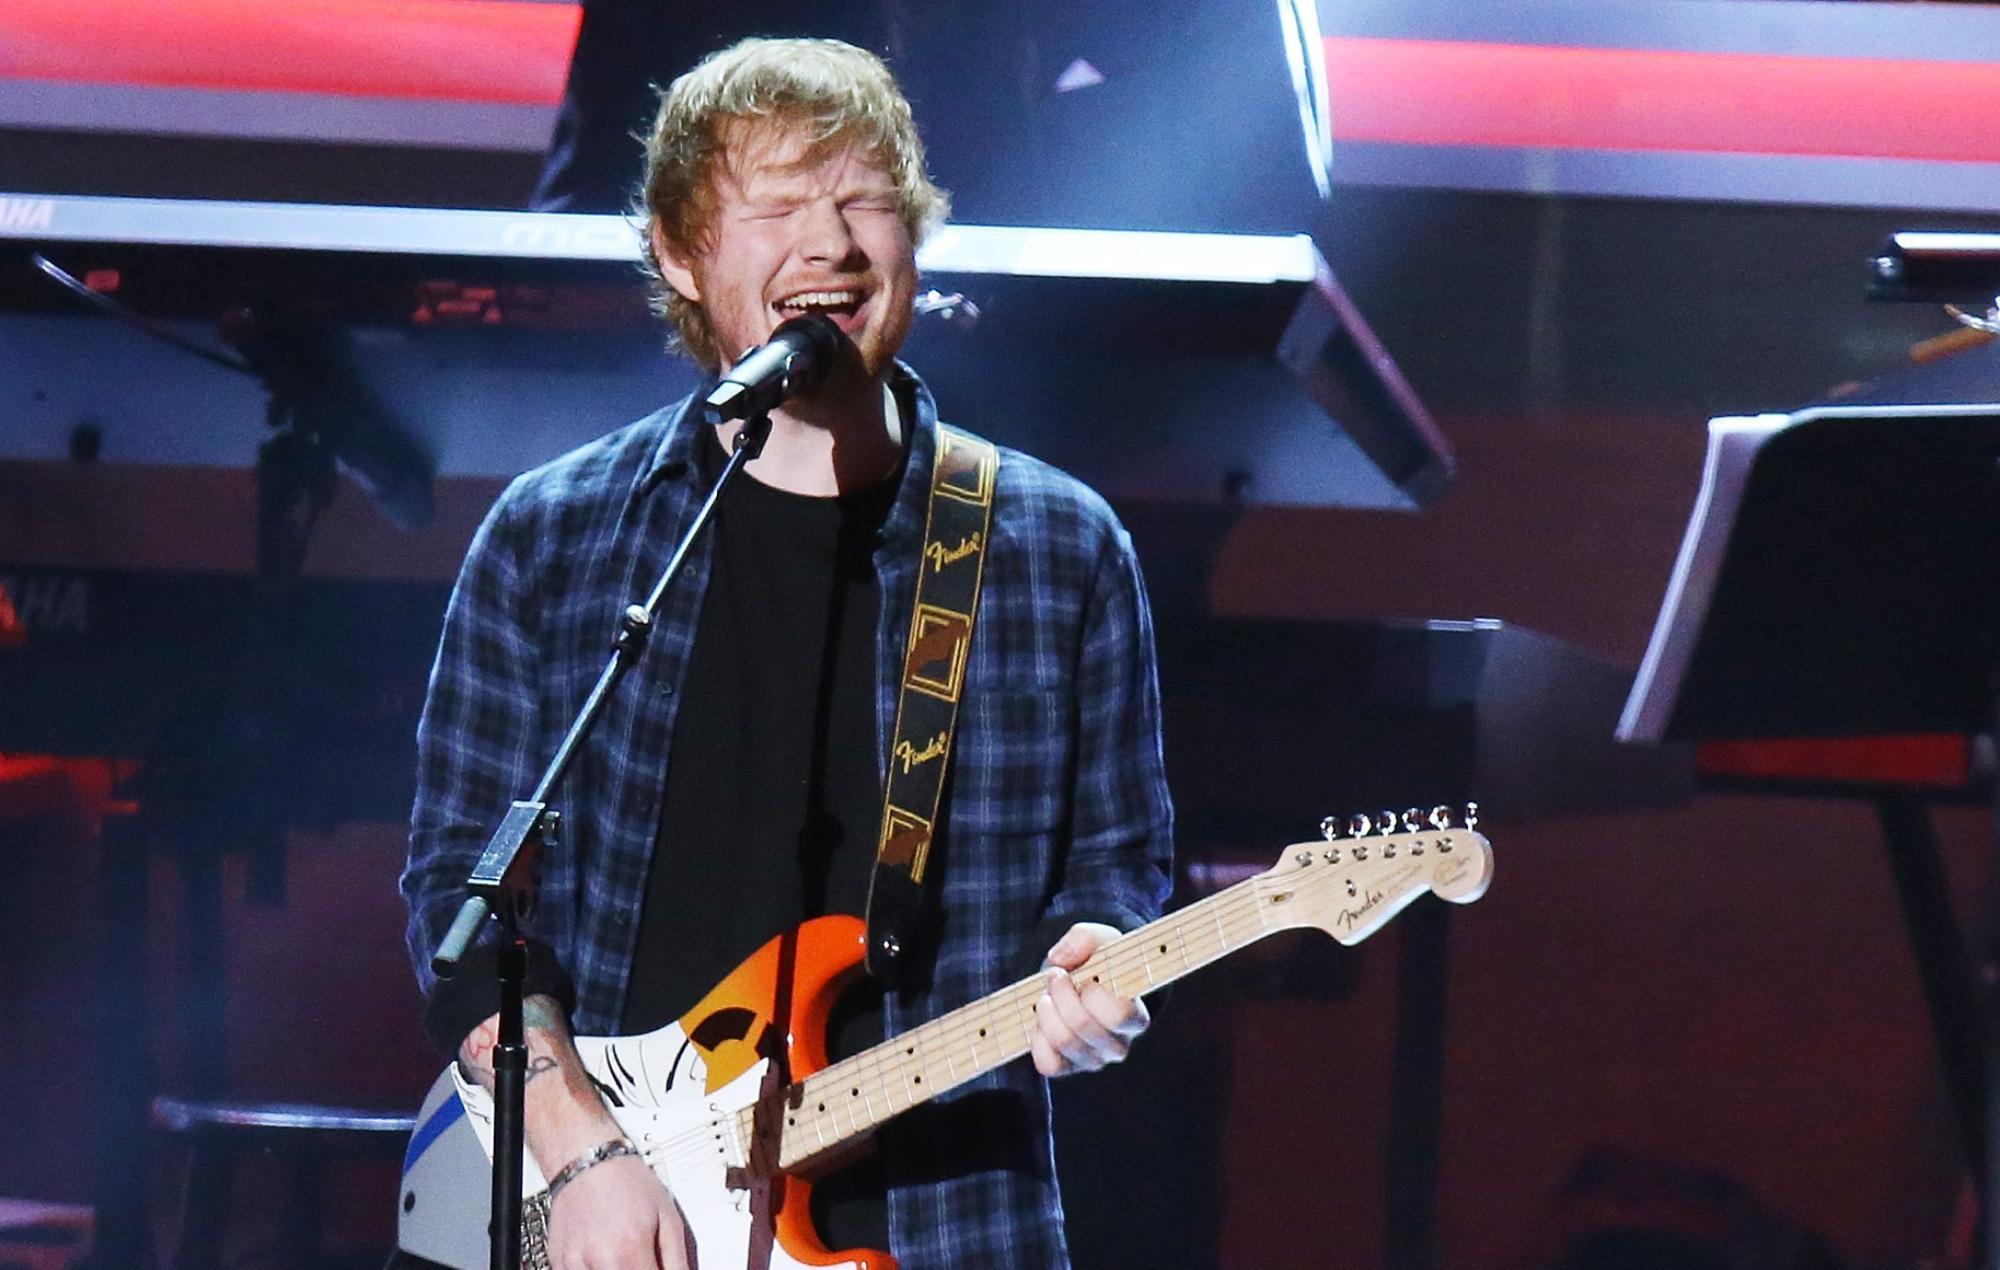 Ed Sheeran Considered Retirement